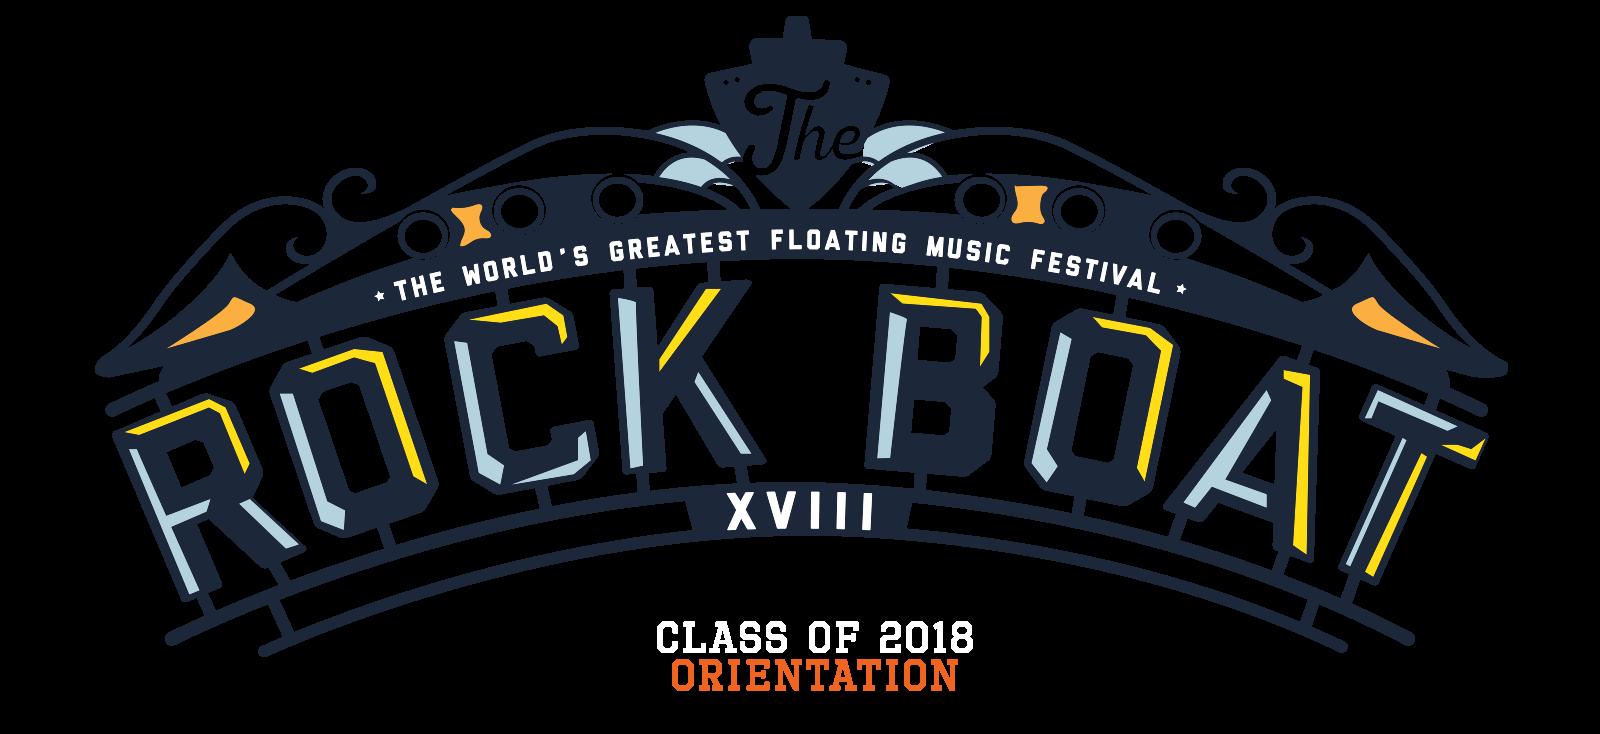 Class of 2018 Orientation - The Rock Boat XVIII